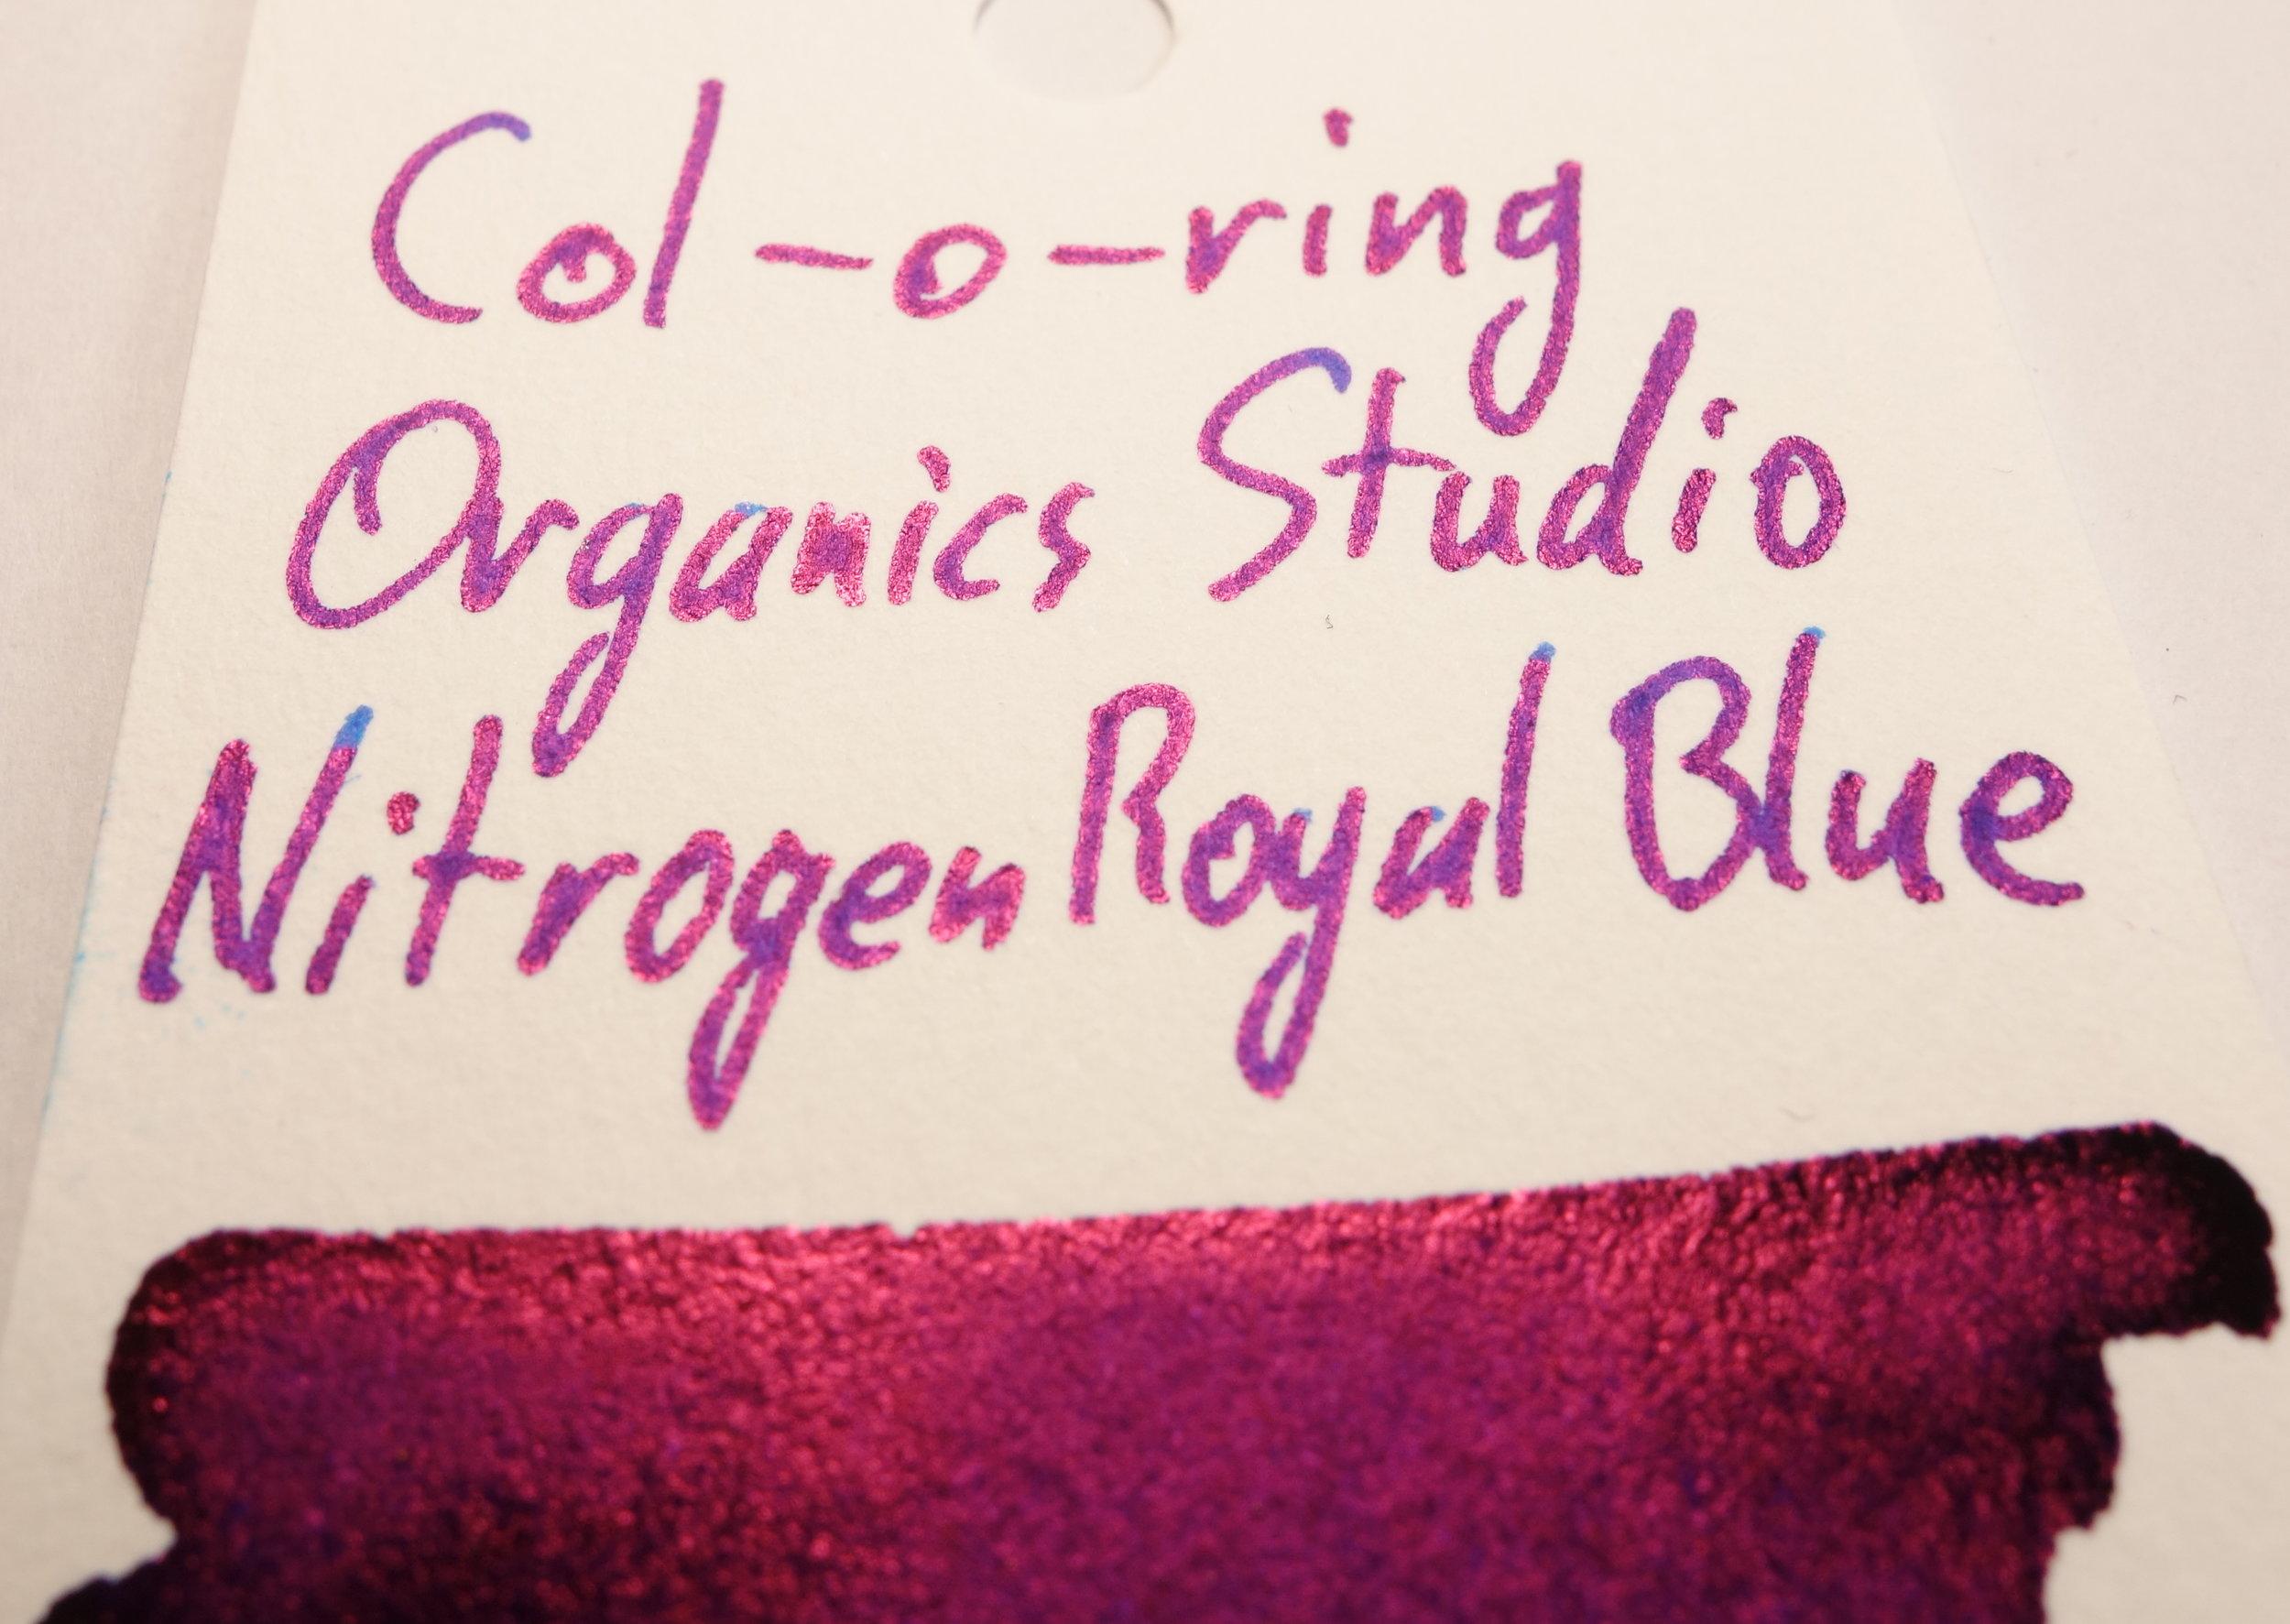 Organics Studio Nitrogen Royal Blue Sheen Col-o-ring.JPG